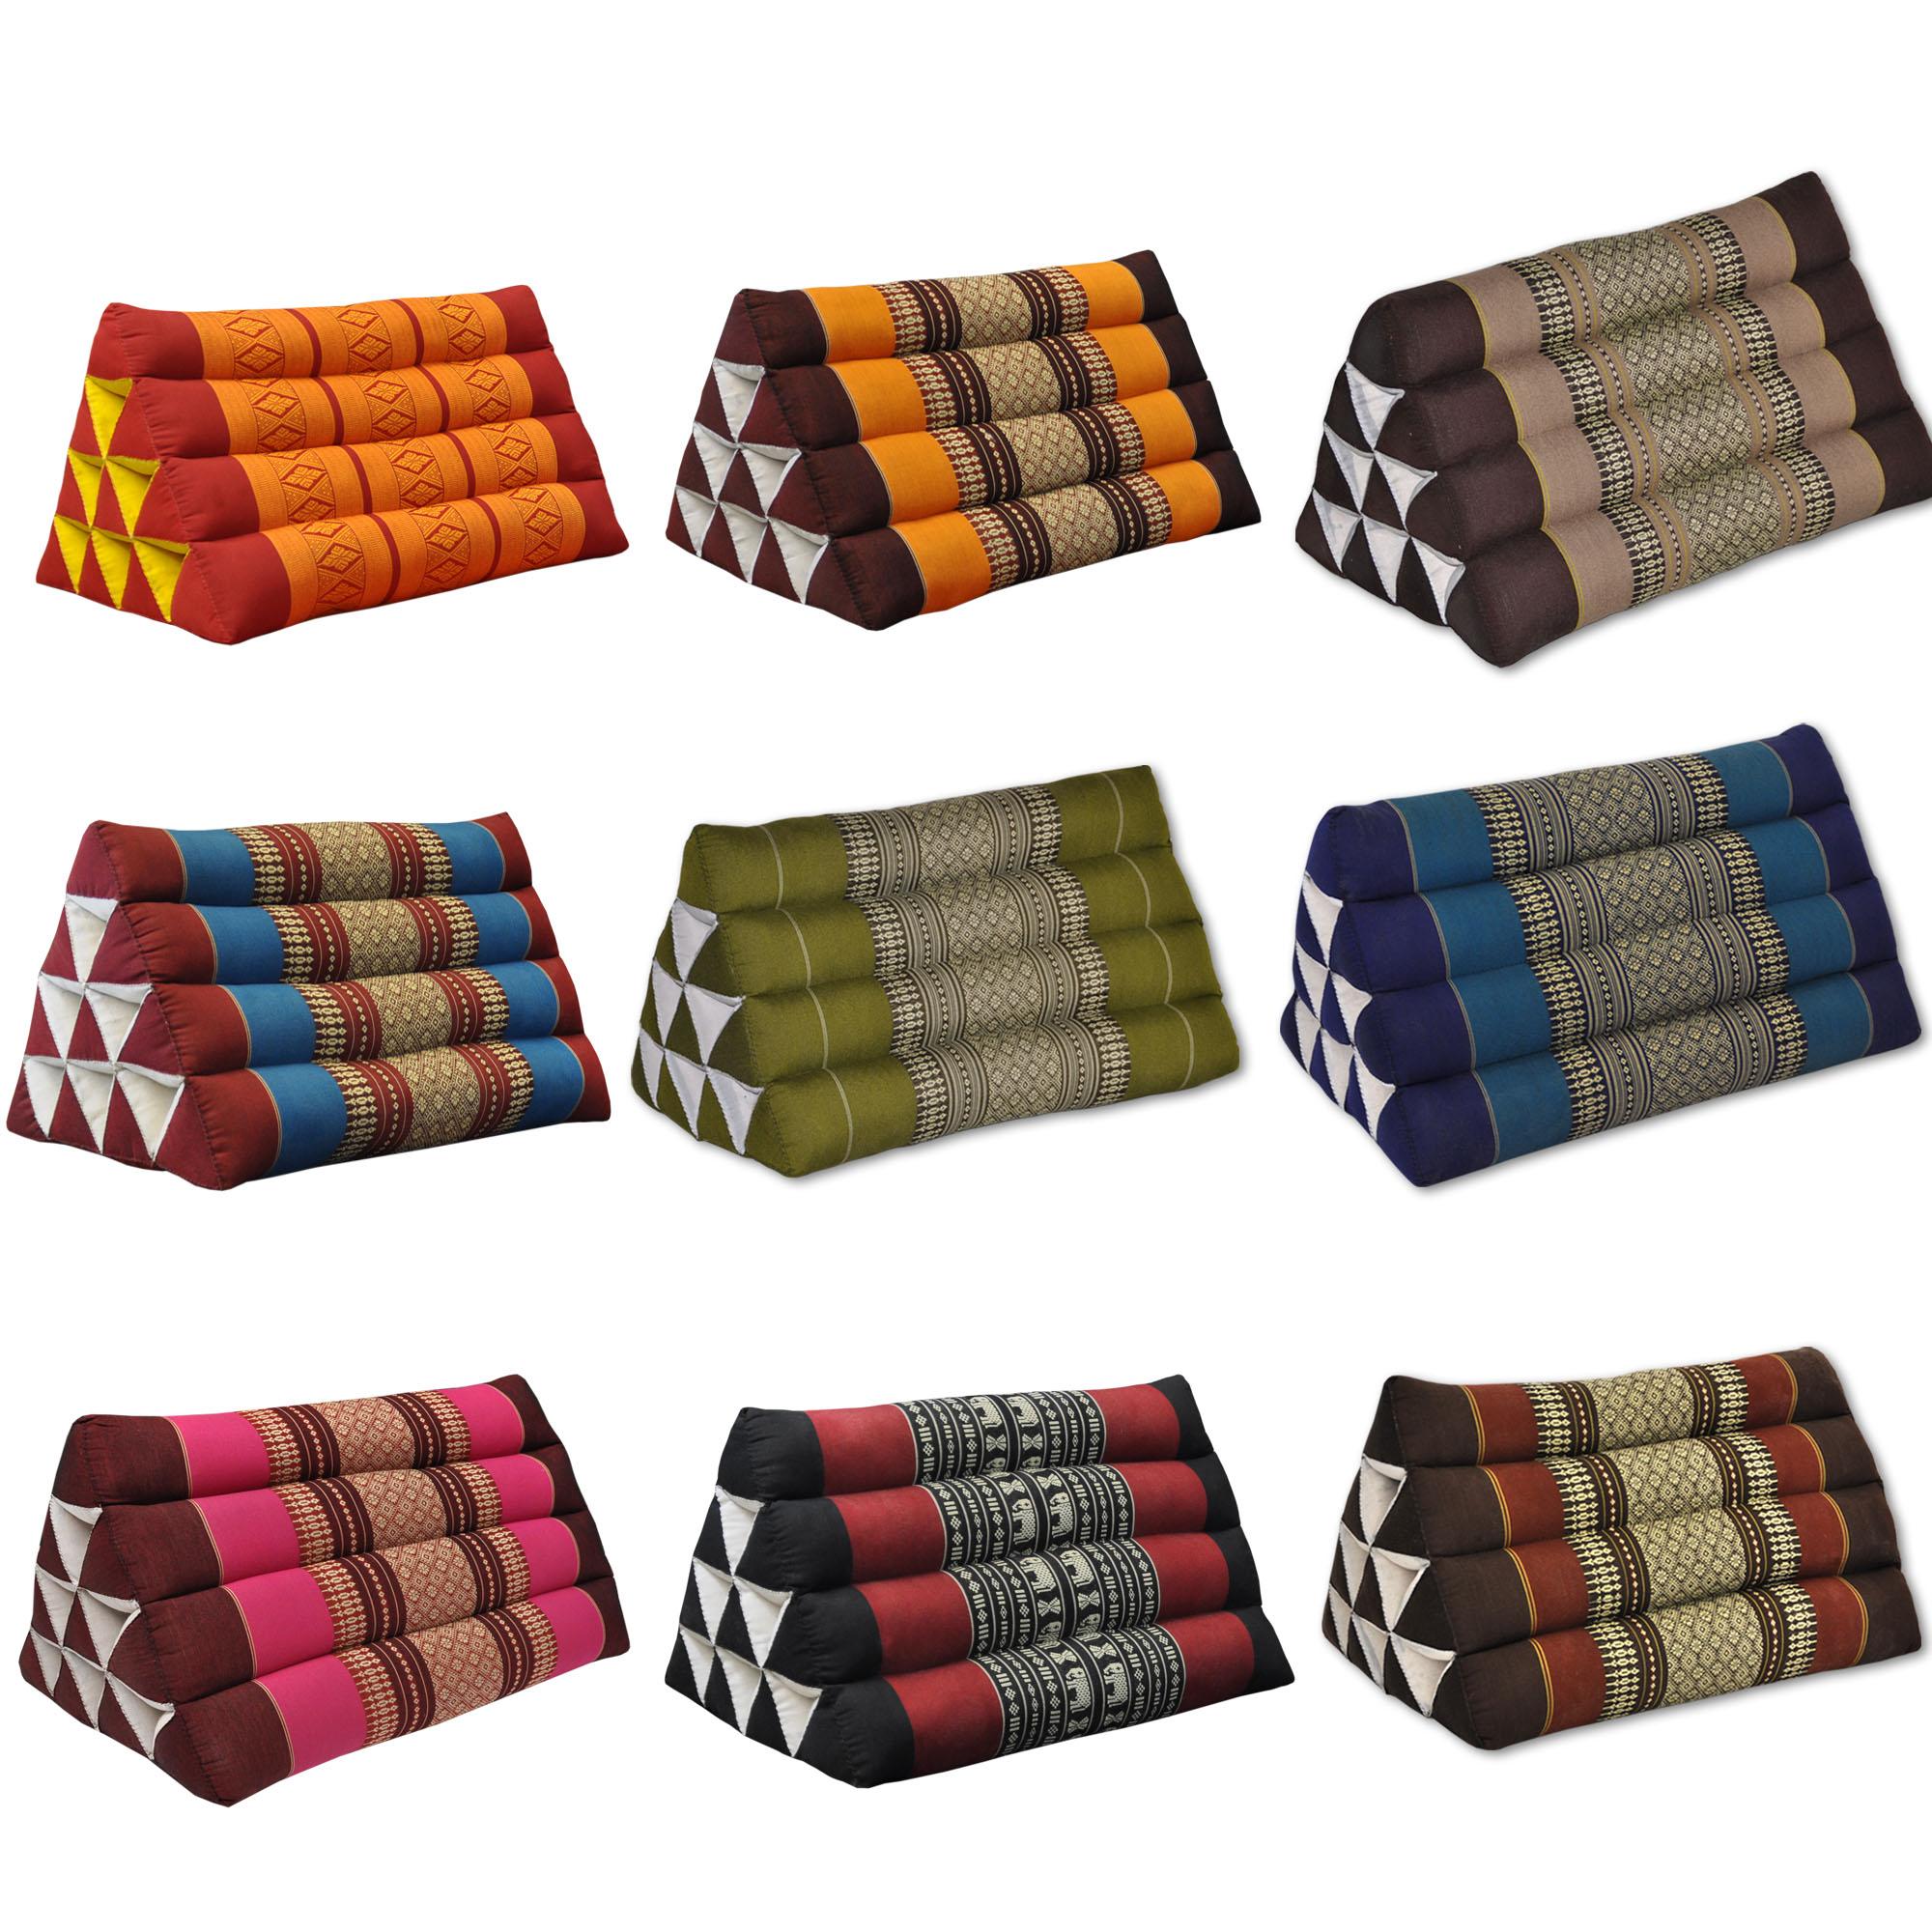 Triangular cushions